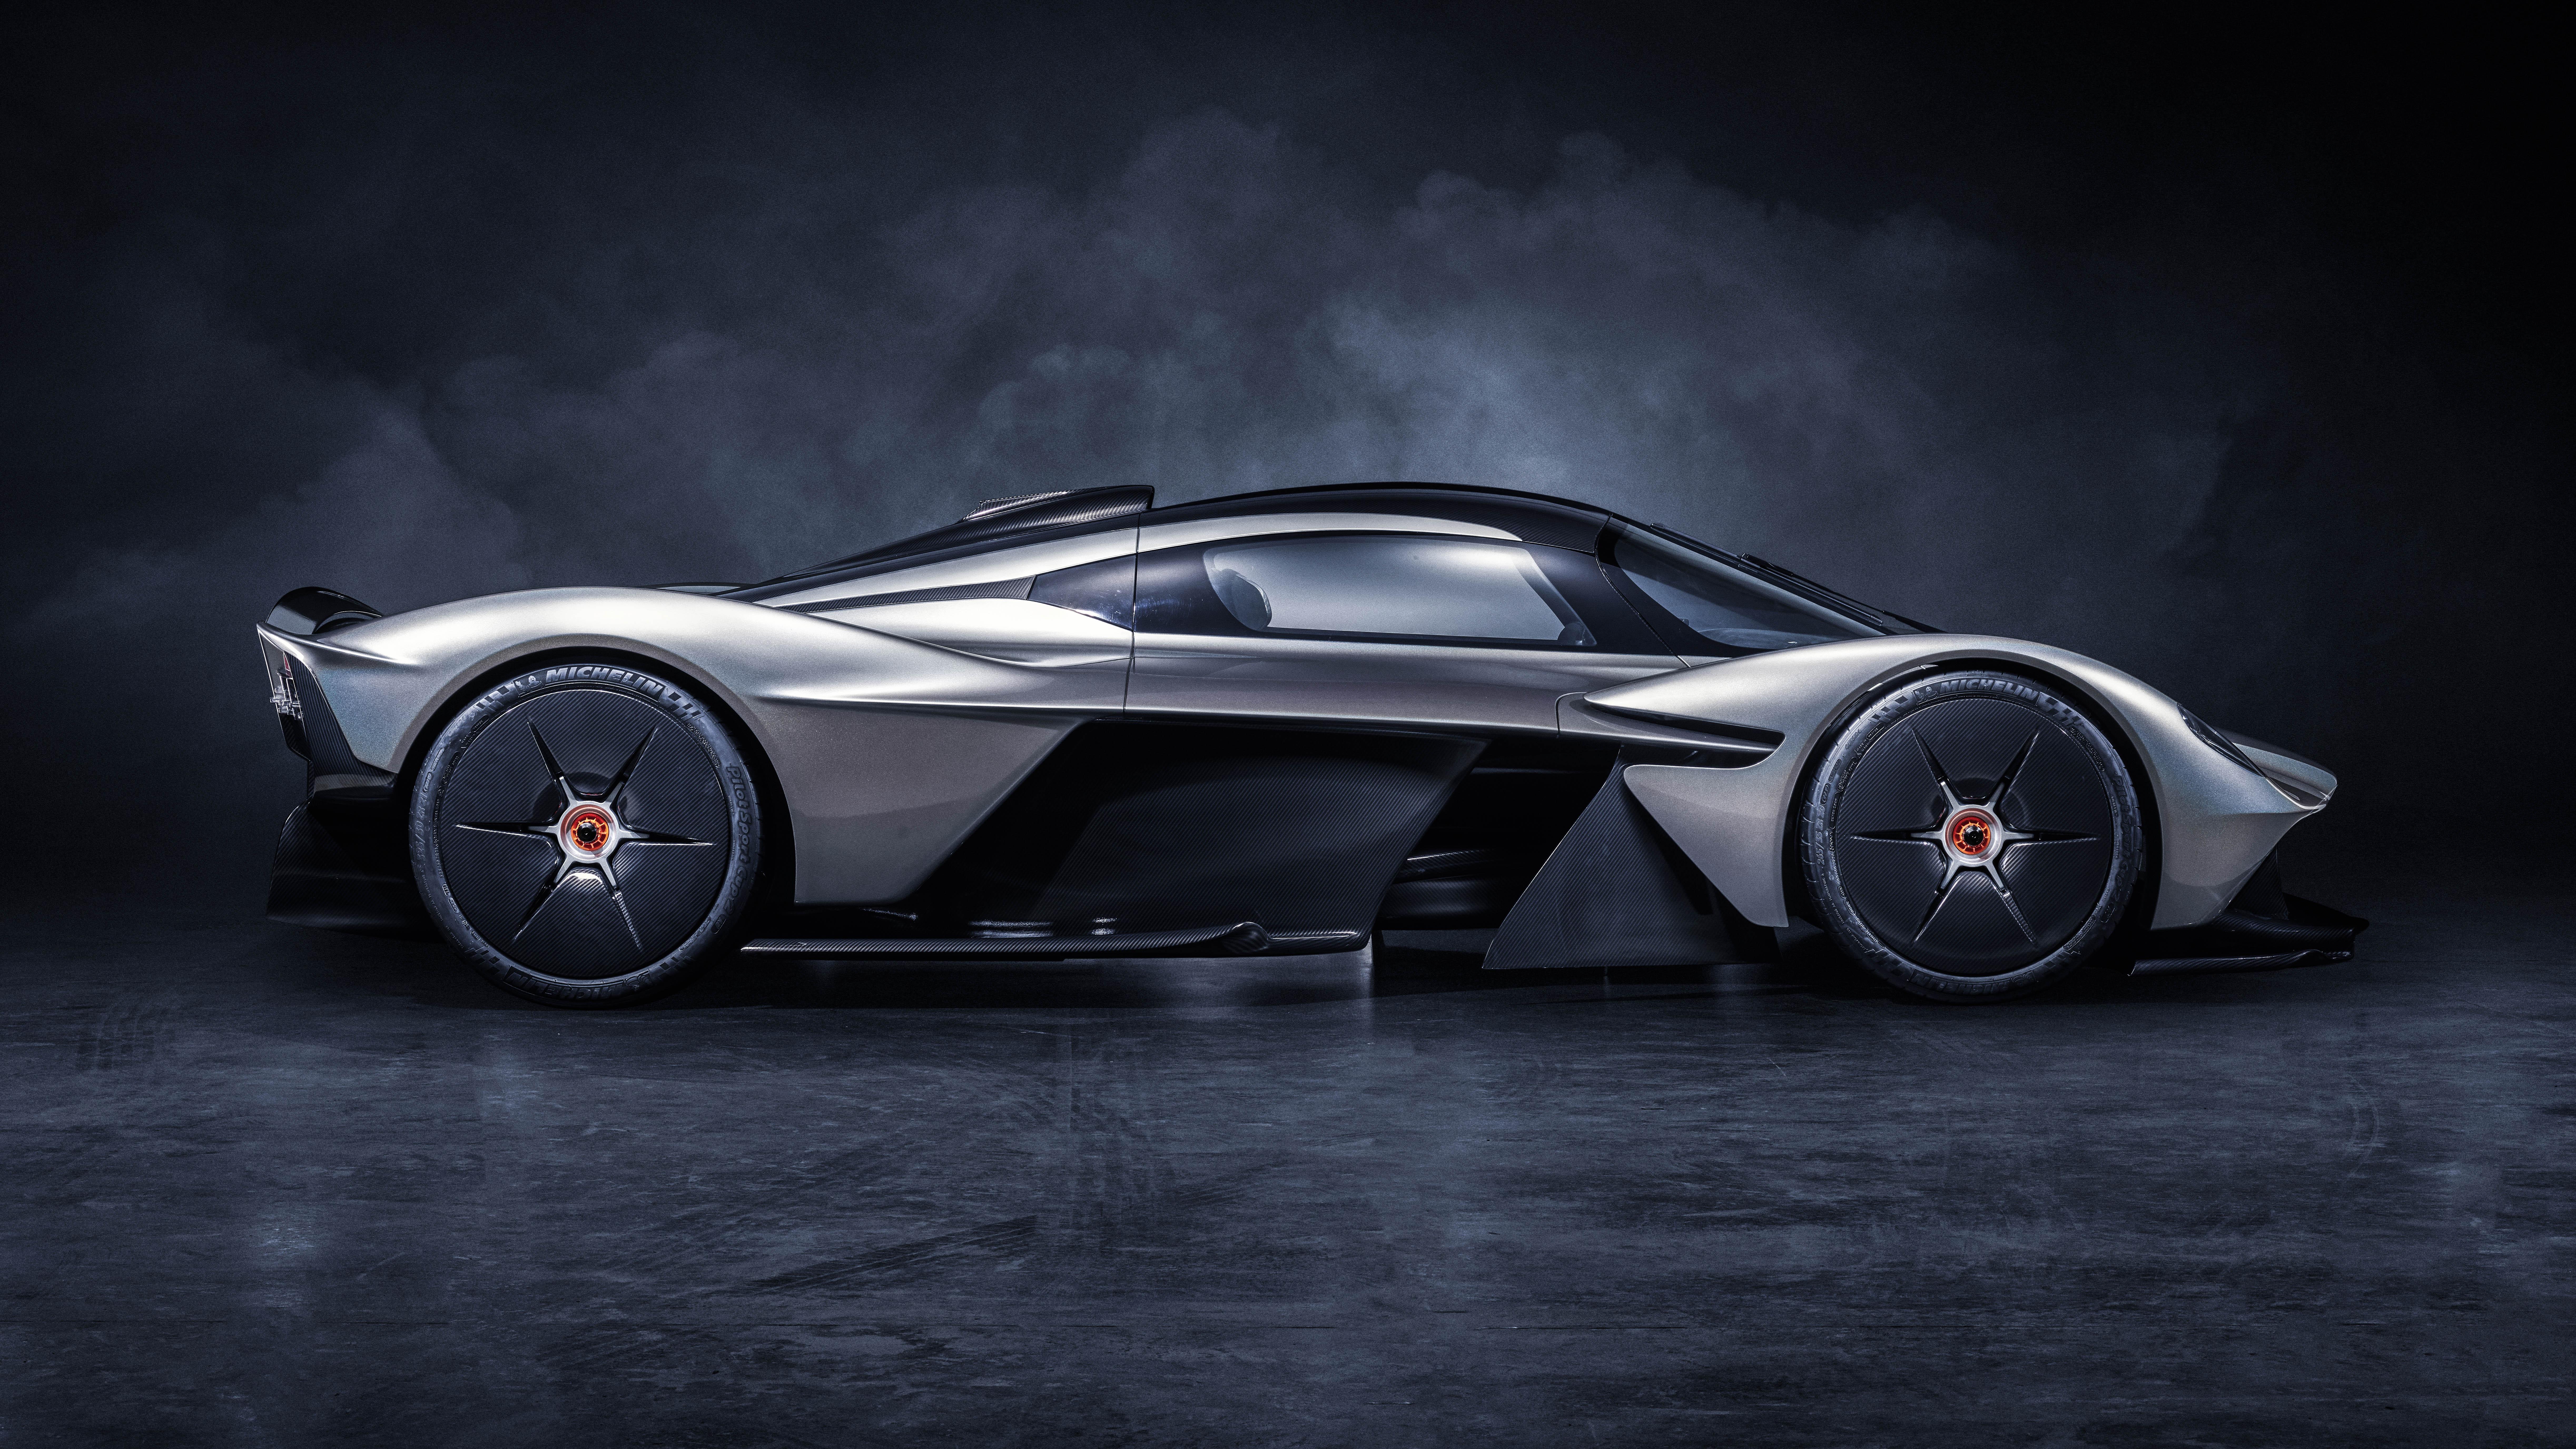 Aston Martin Valkyrie side